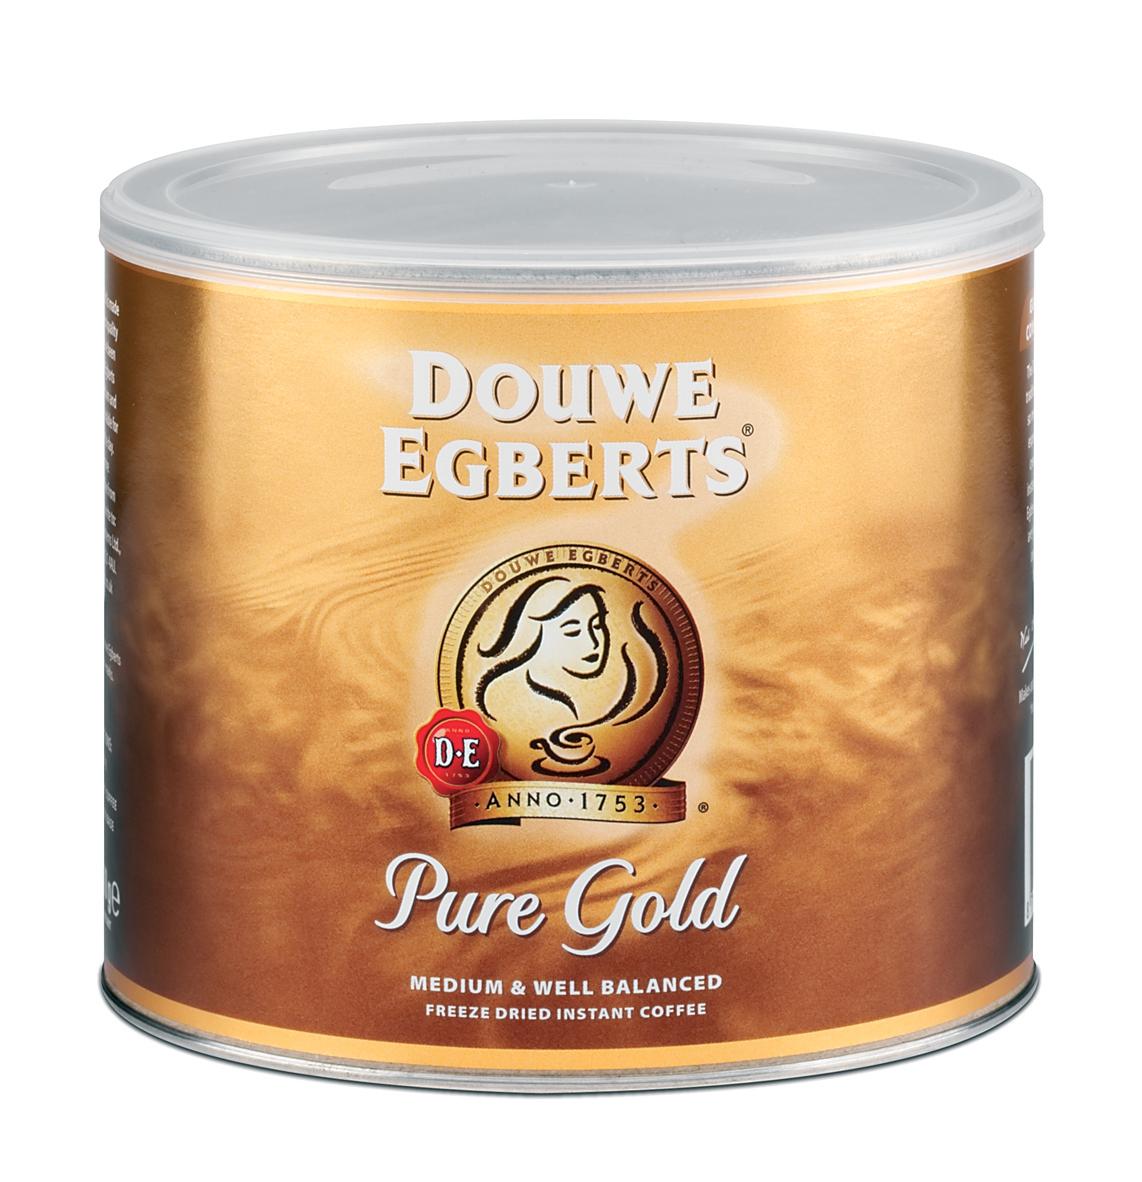 Douwe Egberts Instant Coffee Tin 257500